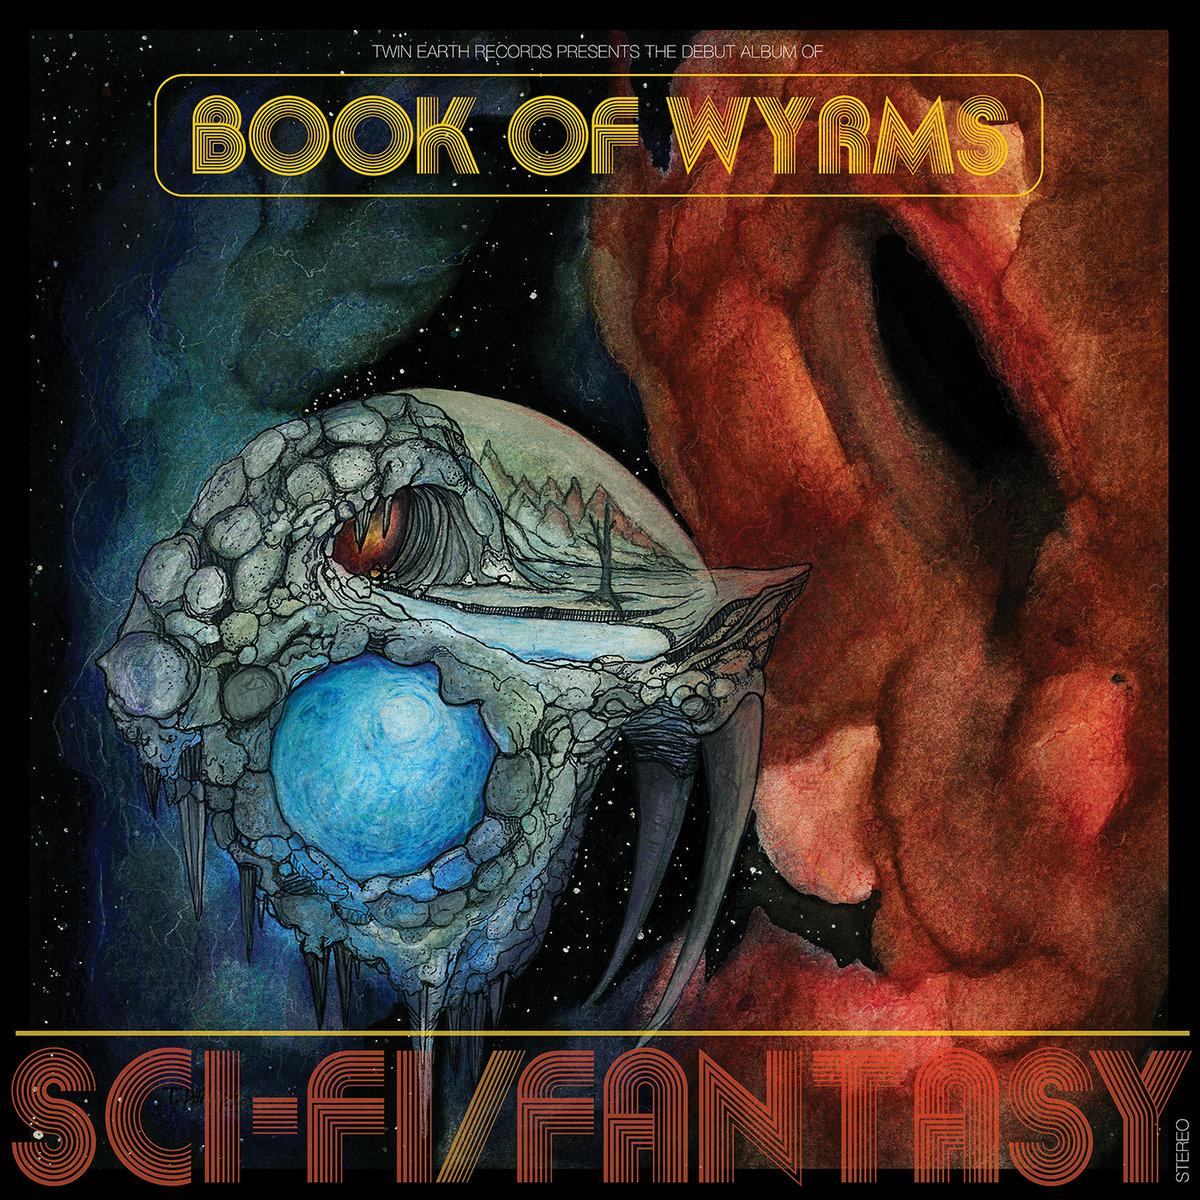 Sci-fi/Fantasy | Book of Wyrms